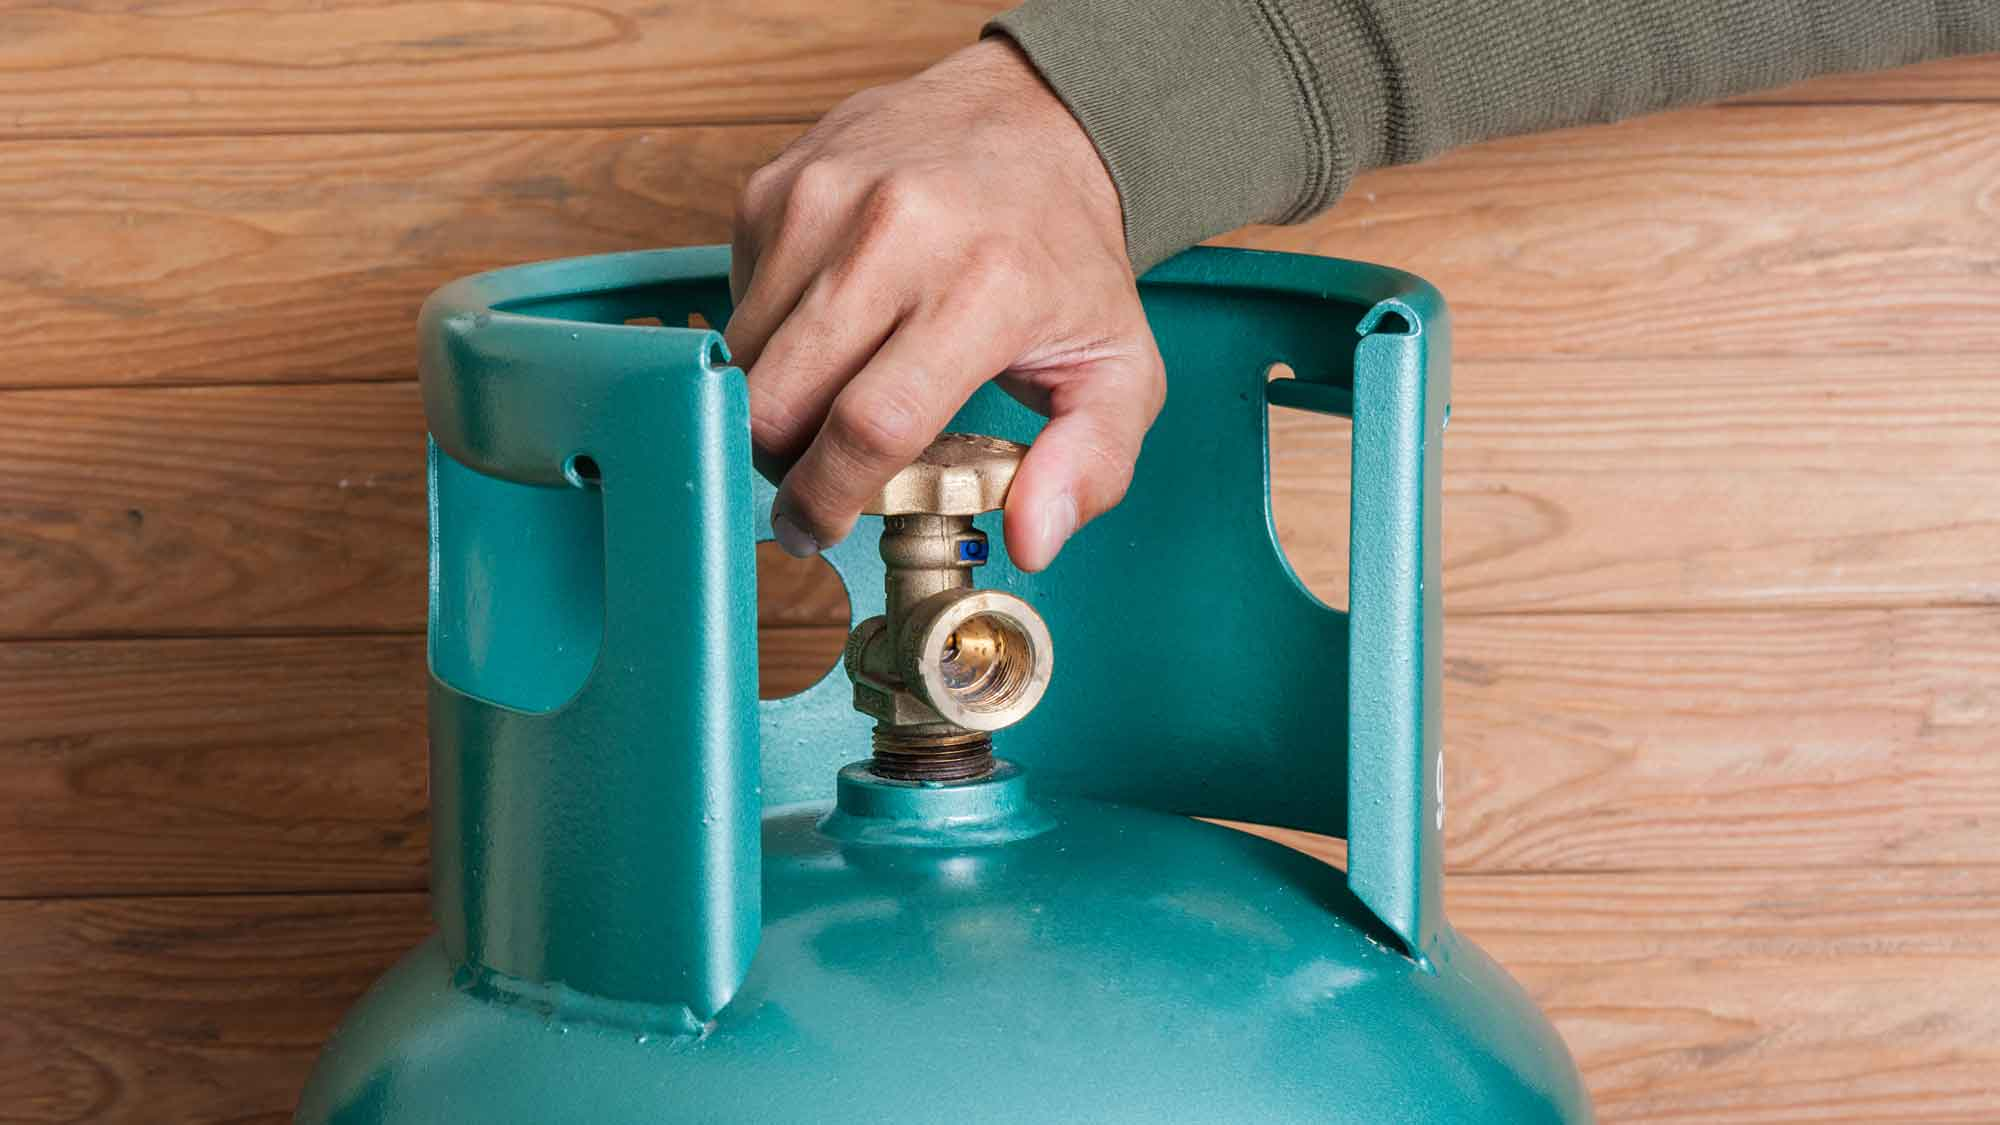 lpg boiler engineer essex maintenance leigh on sea close up